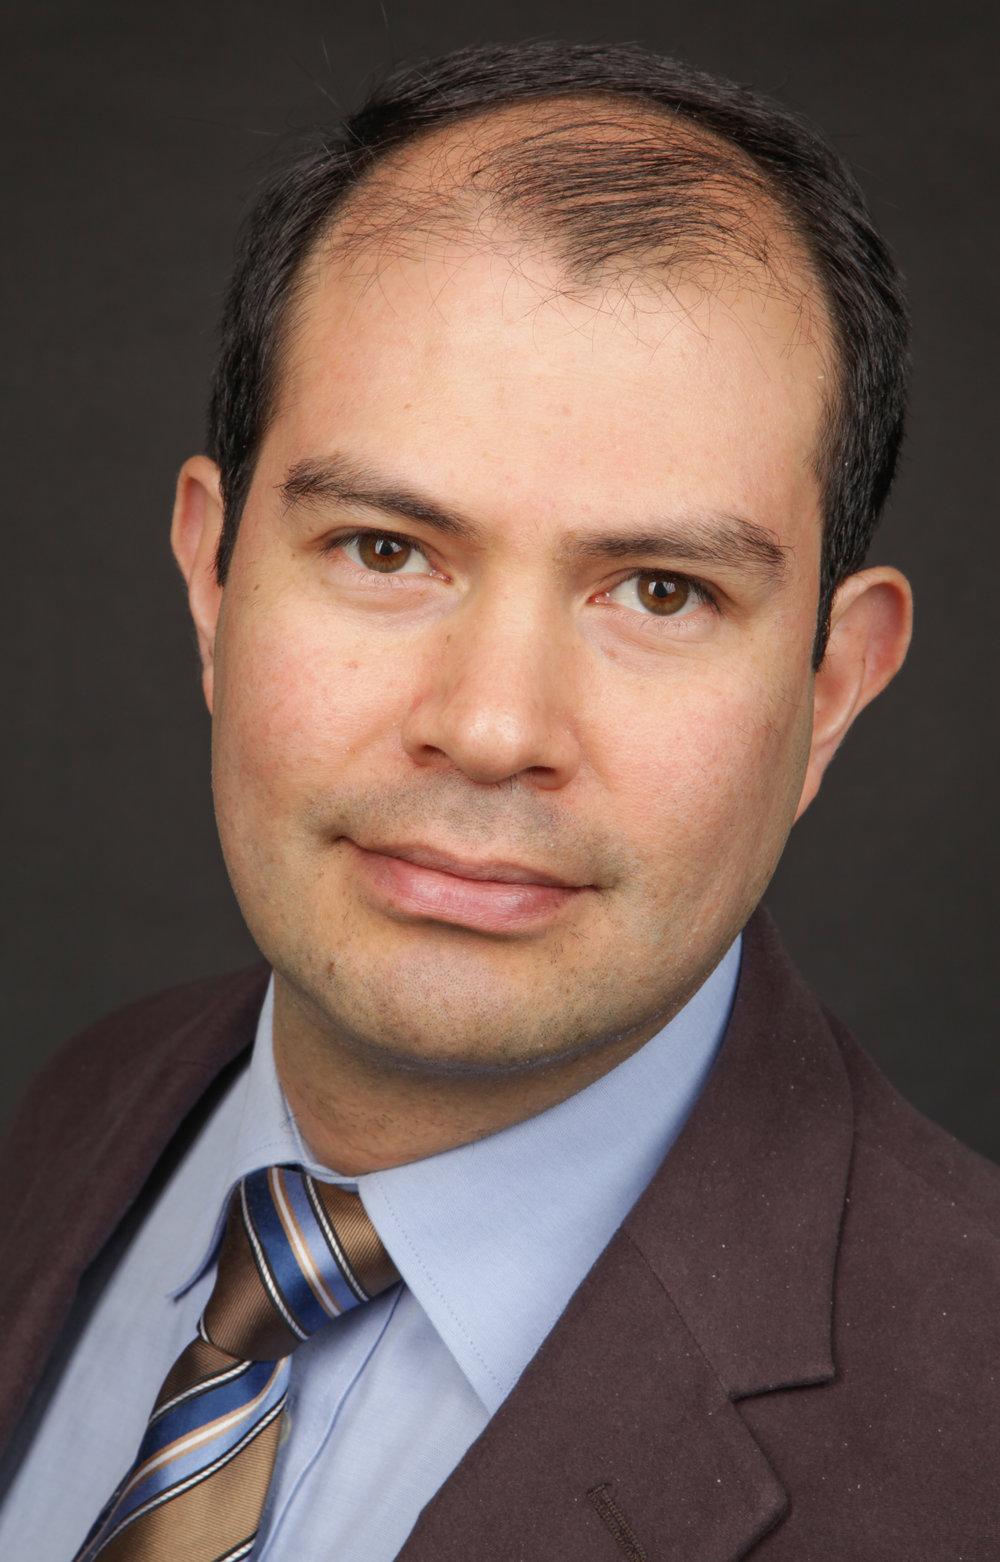 Dr. Arturo Castillo Castillo - Research Fellow at Imperial College & Leader of Plastic Solutions Network